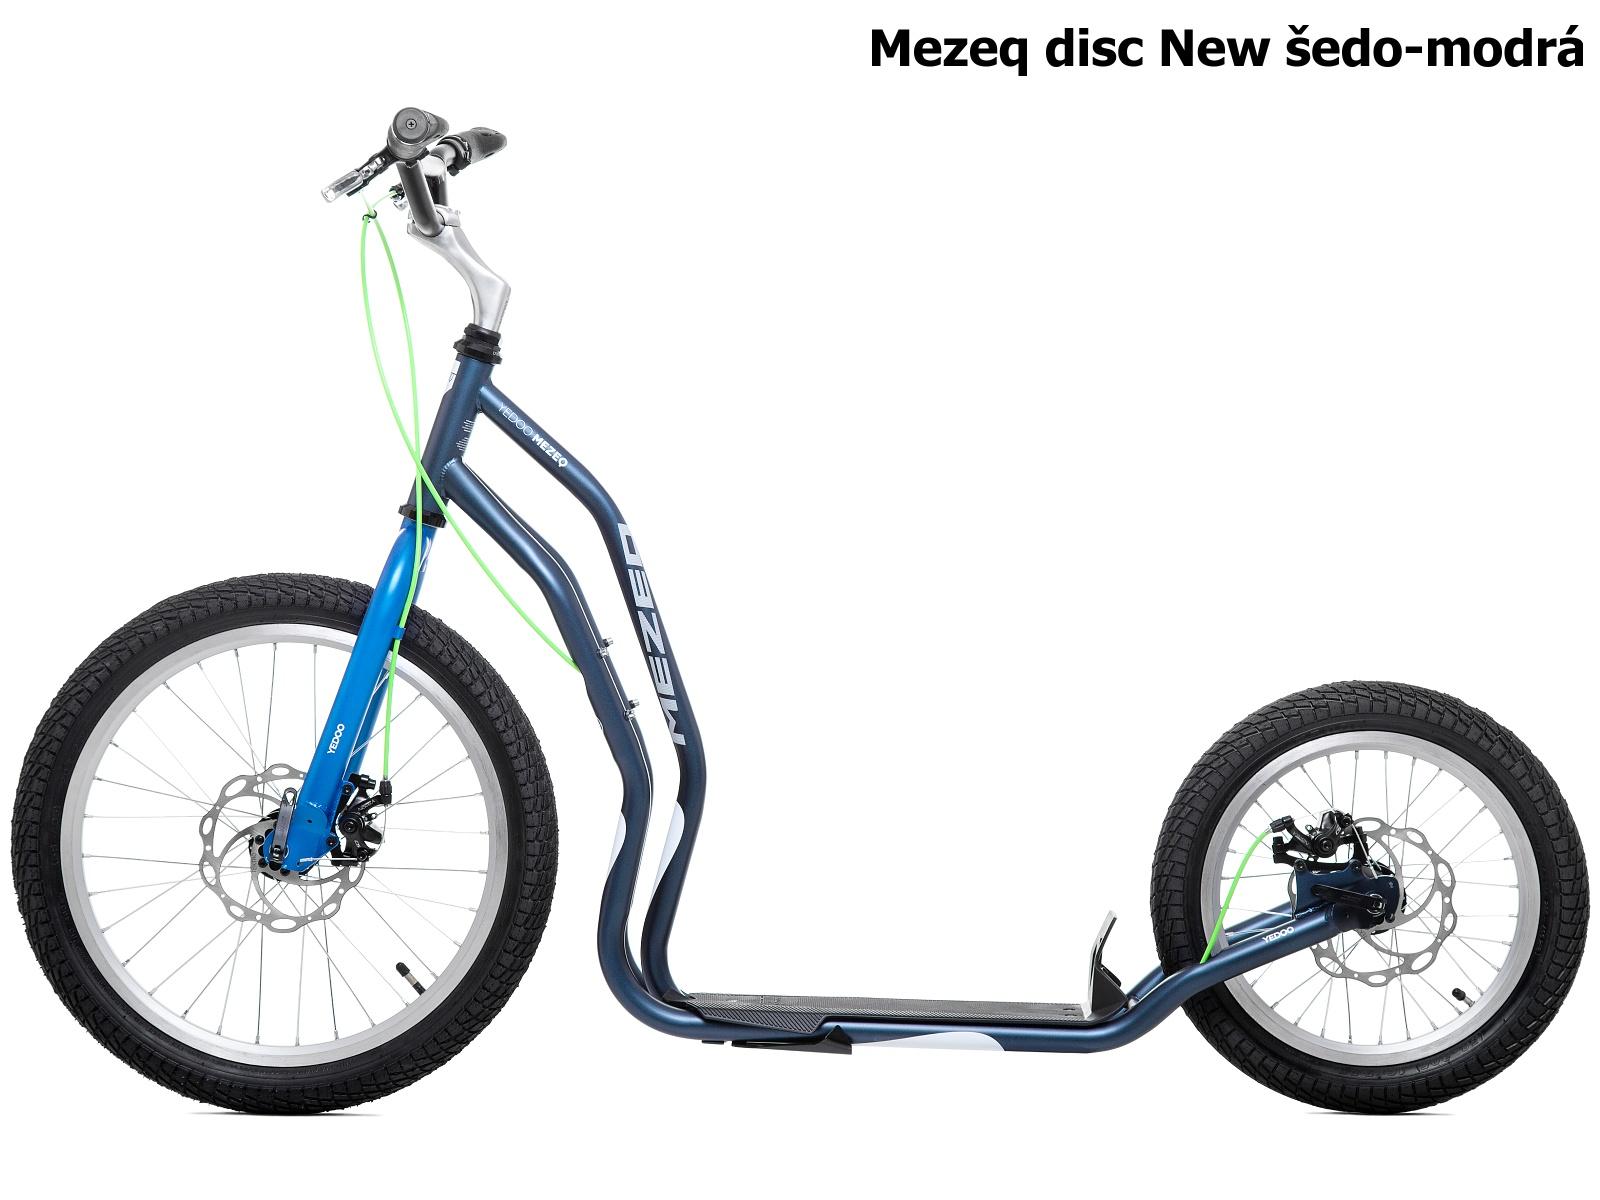 Koloběžka YEDOO Mezeq disc New 20-16 šedo-modrá